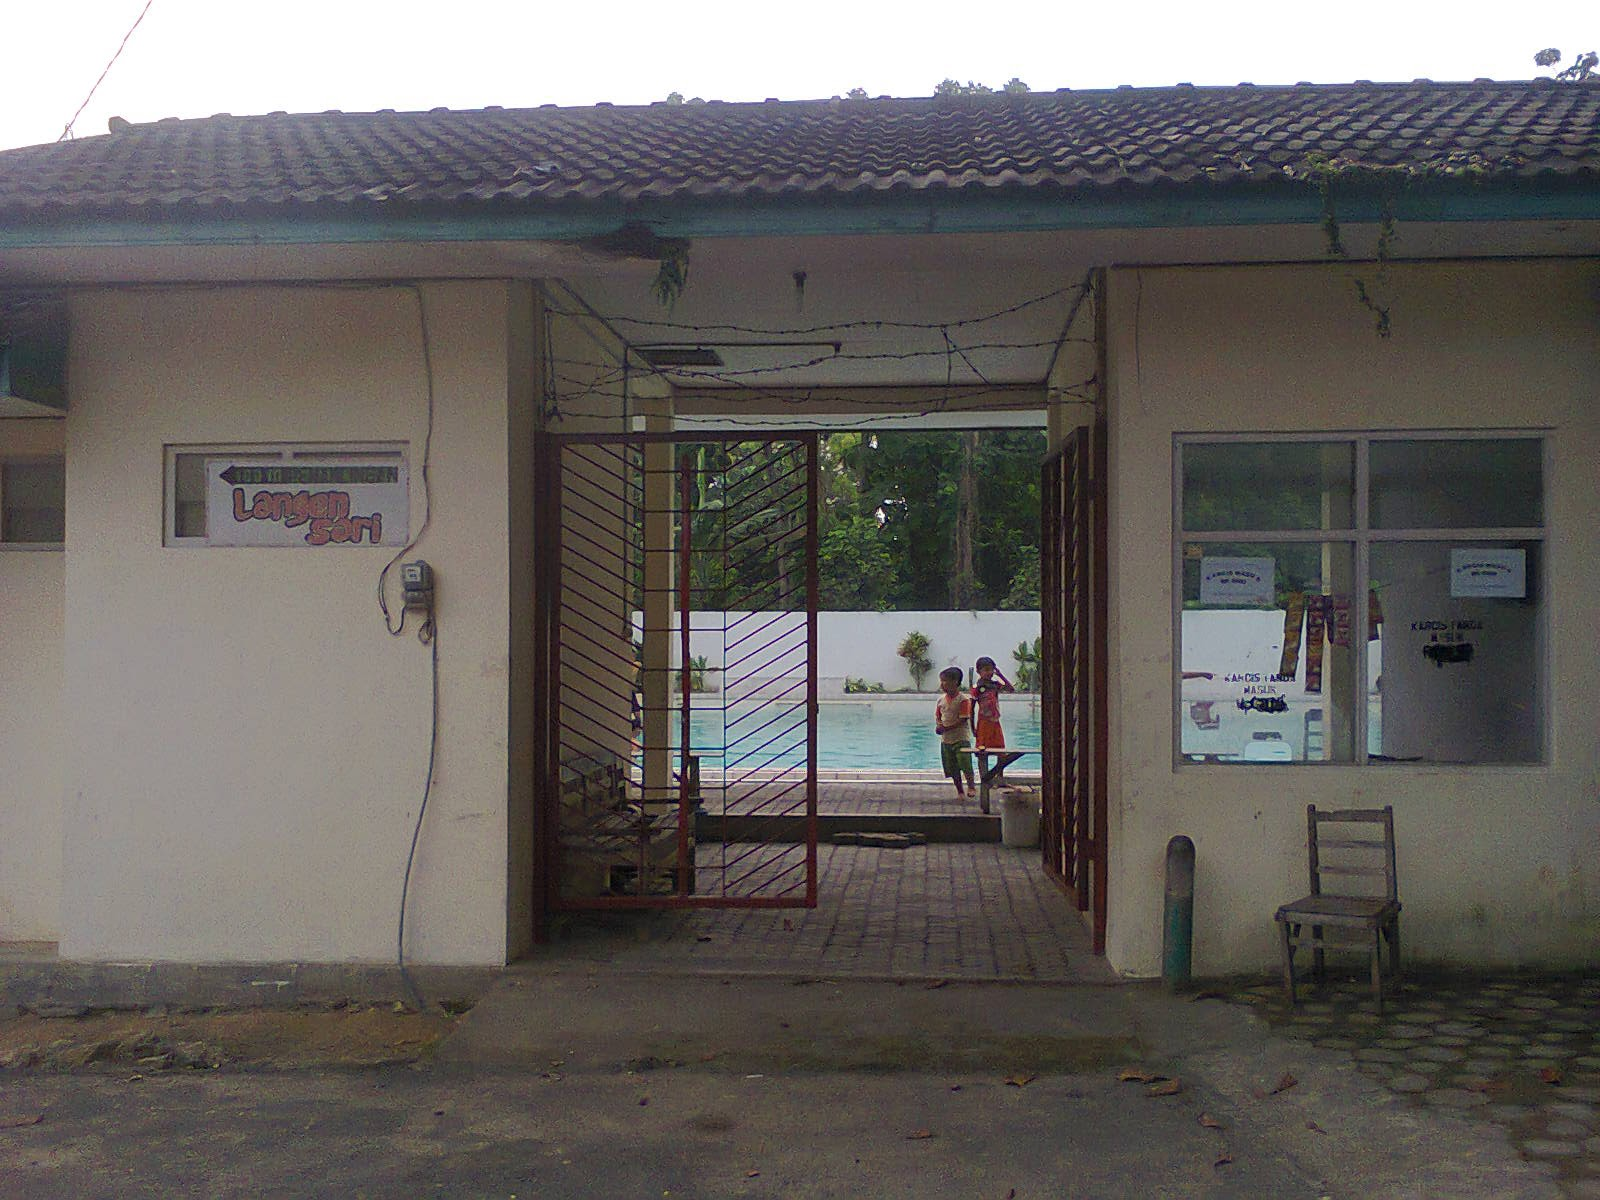 Objek Wisata Sumber Jatipohon Kabupaten Grobogan Nurulhenikhotimah 27370 Foto0207 Jpg